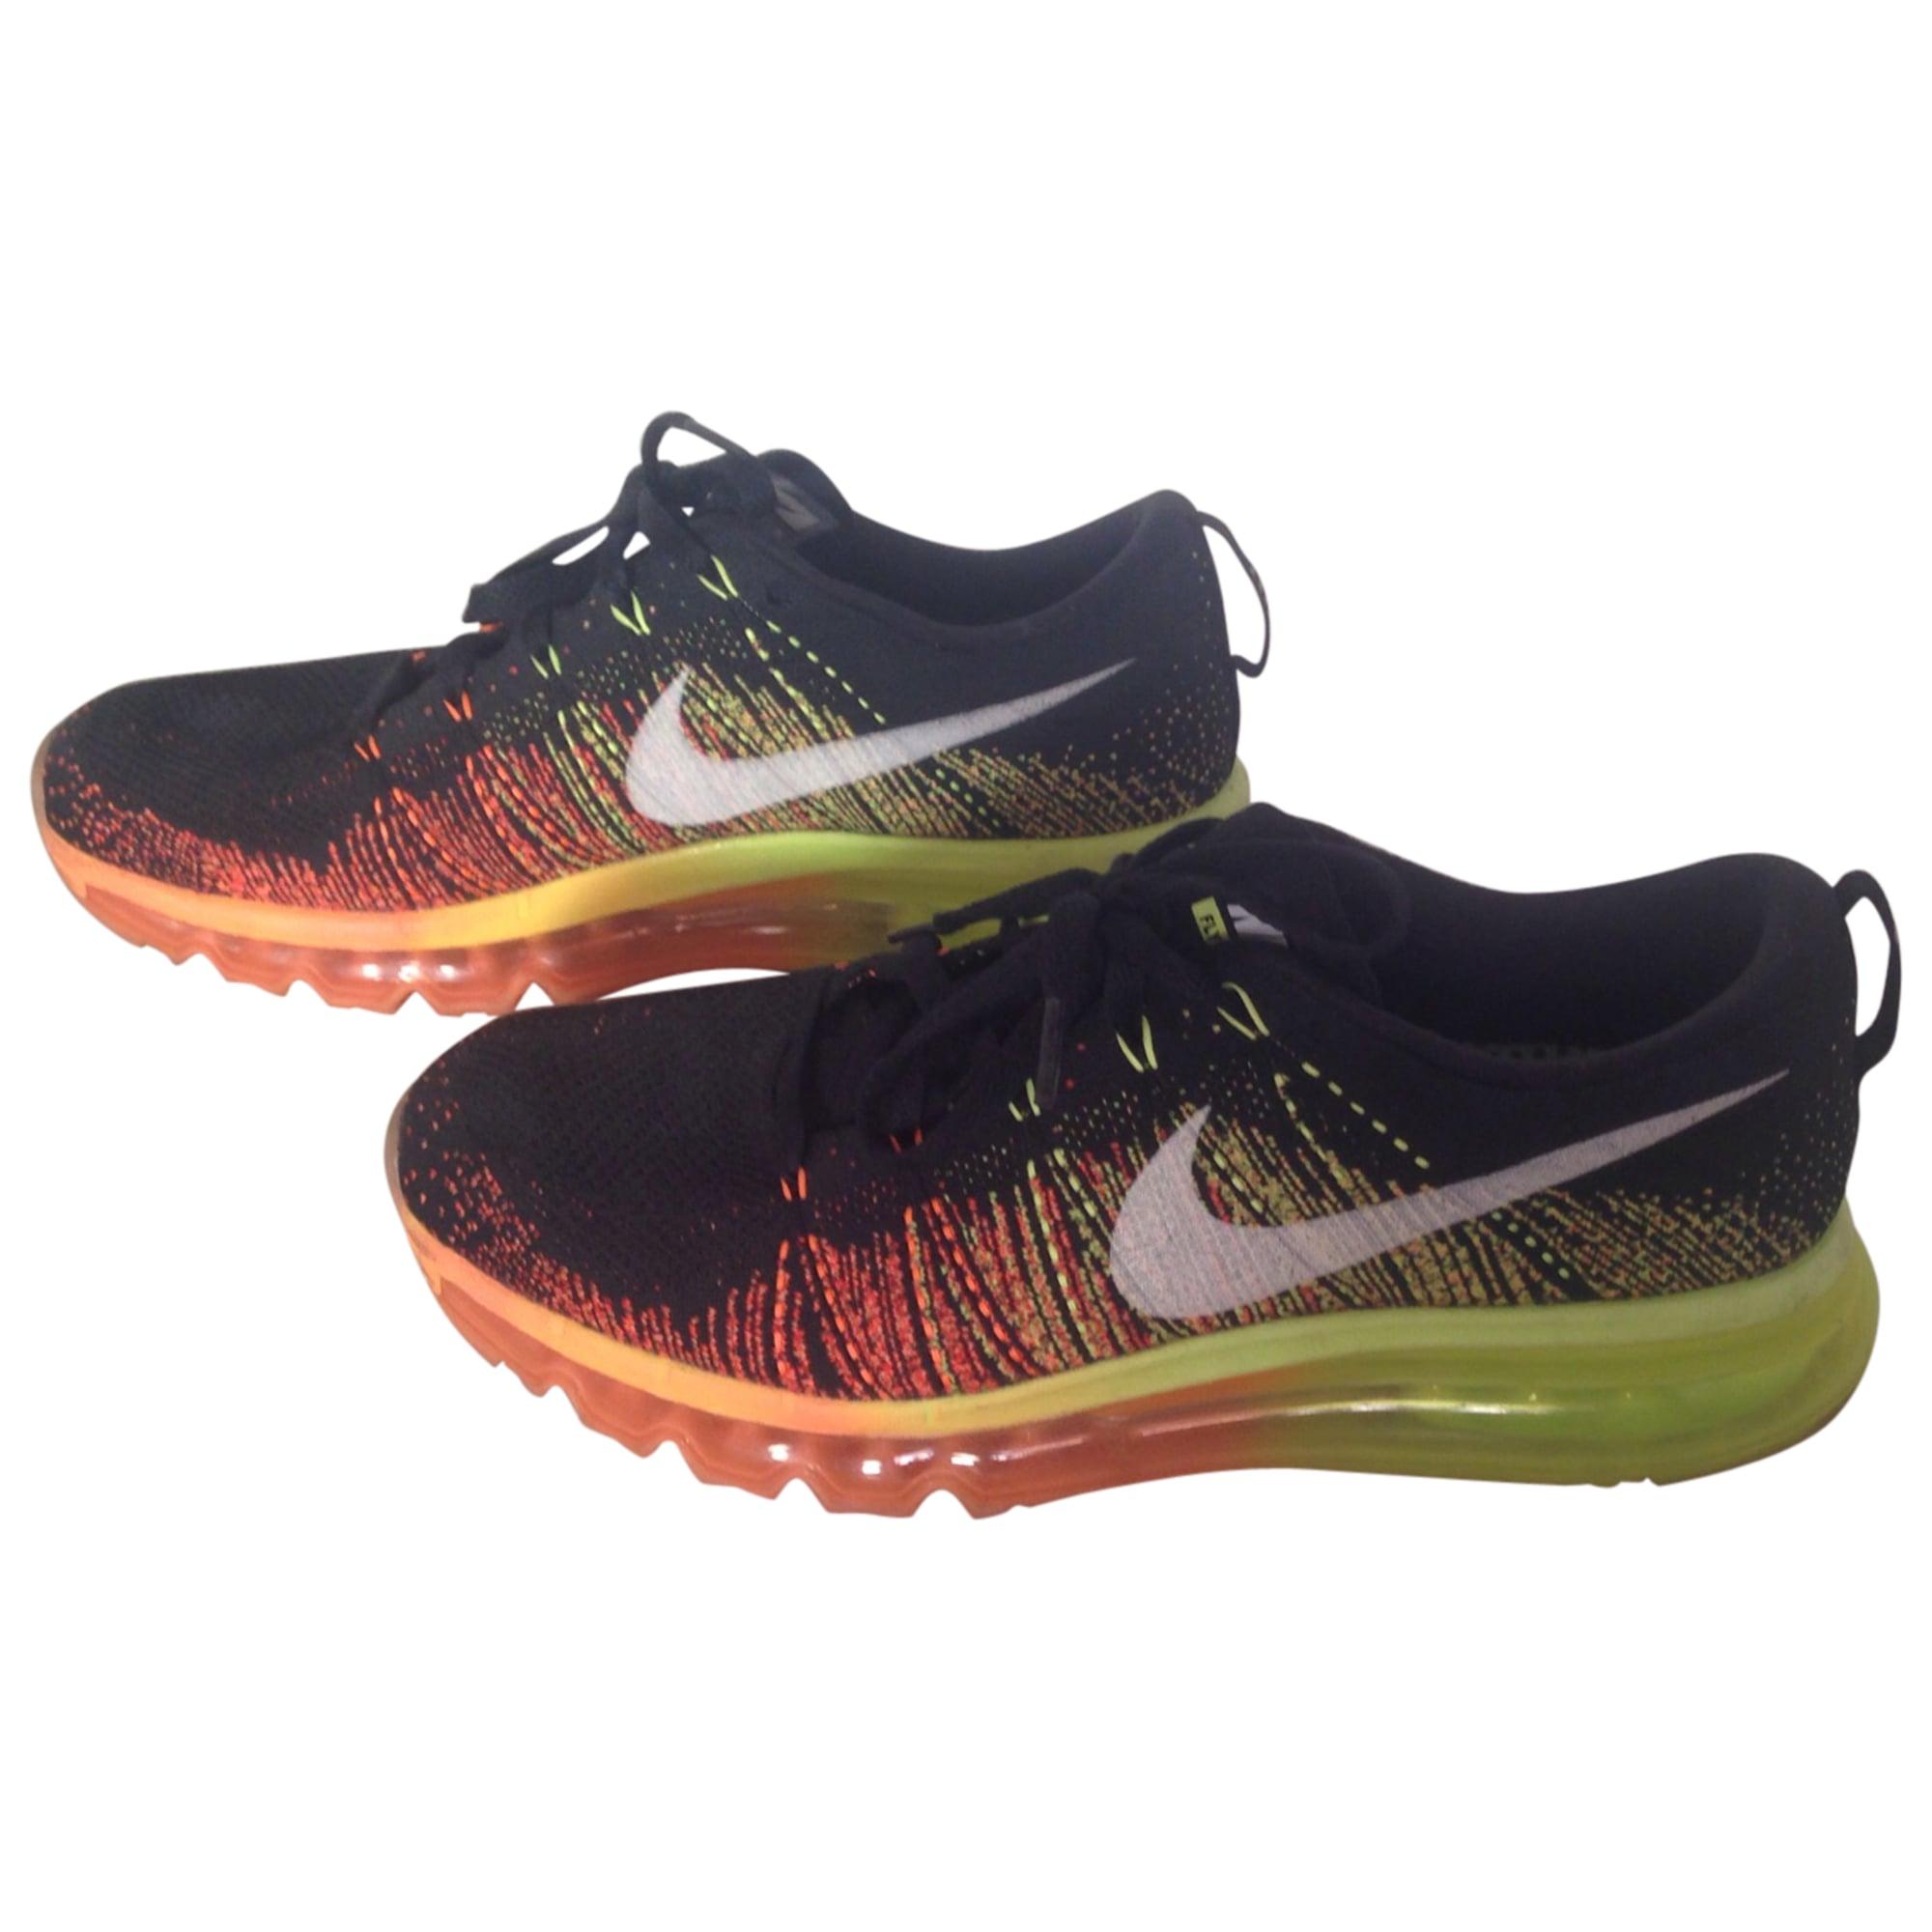 5 4028781 Multicouleur Nike 42 Chaussures Nx0o8kwpn De Sport CeBoWdQrx